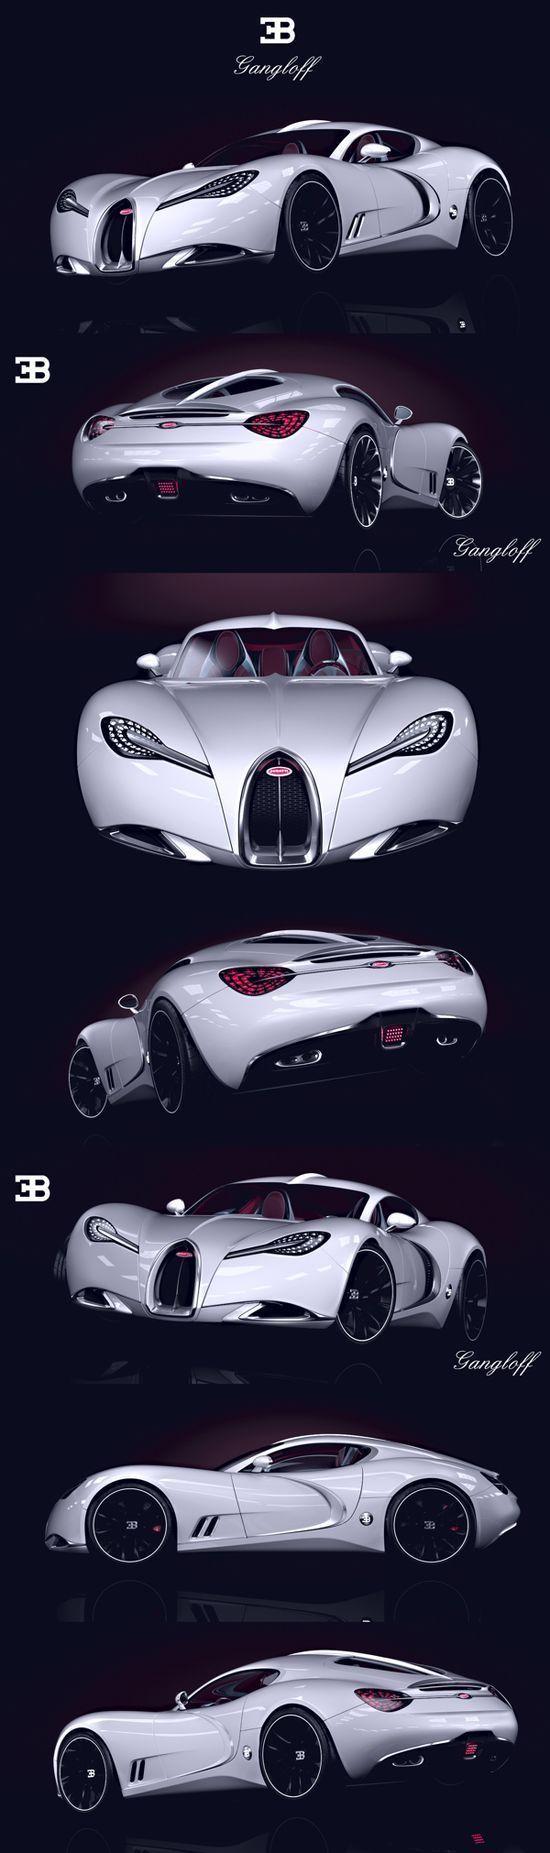 BUGATTI GANGLOFF CONCEPT #luxury sports cars #celebritys sport cars #customized…